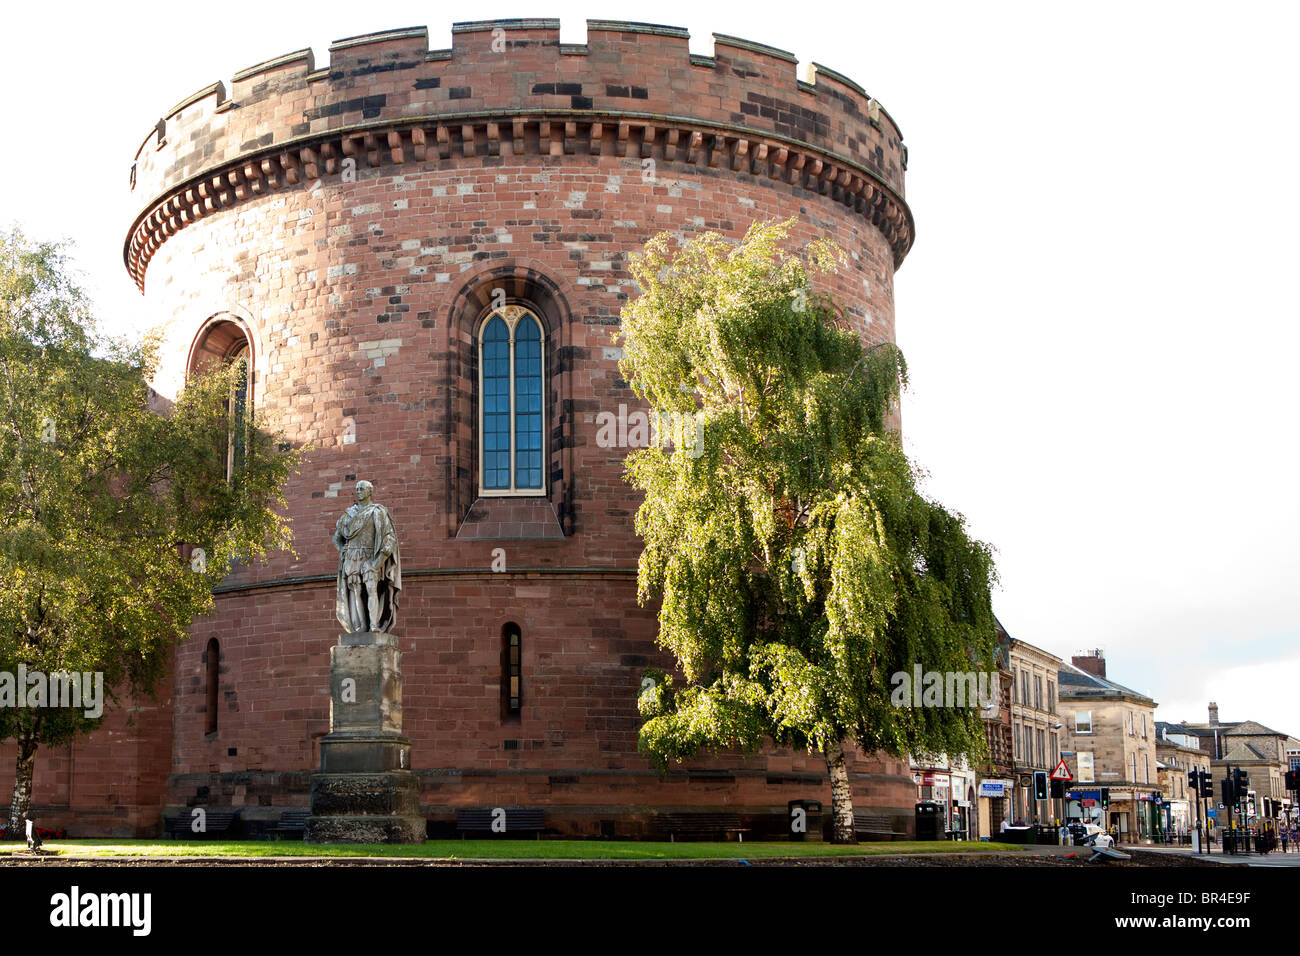 Carlisle Citadel - Stock Image